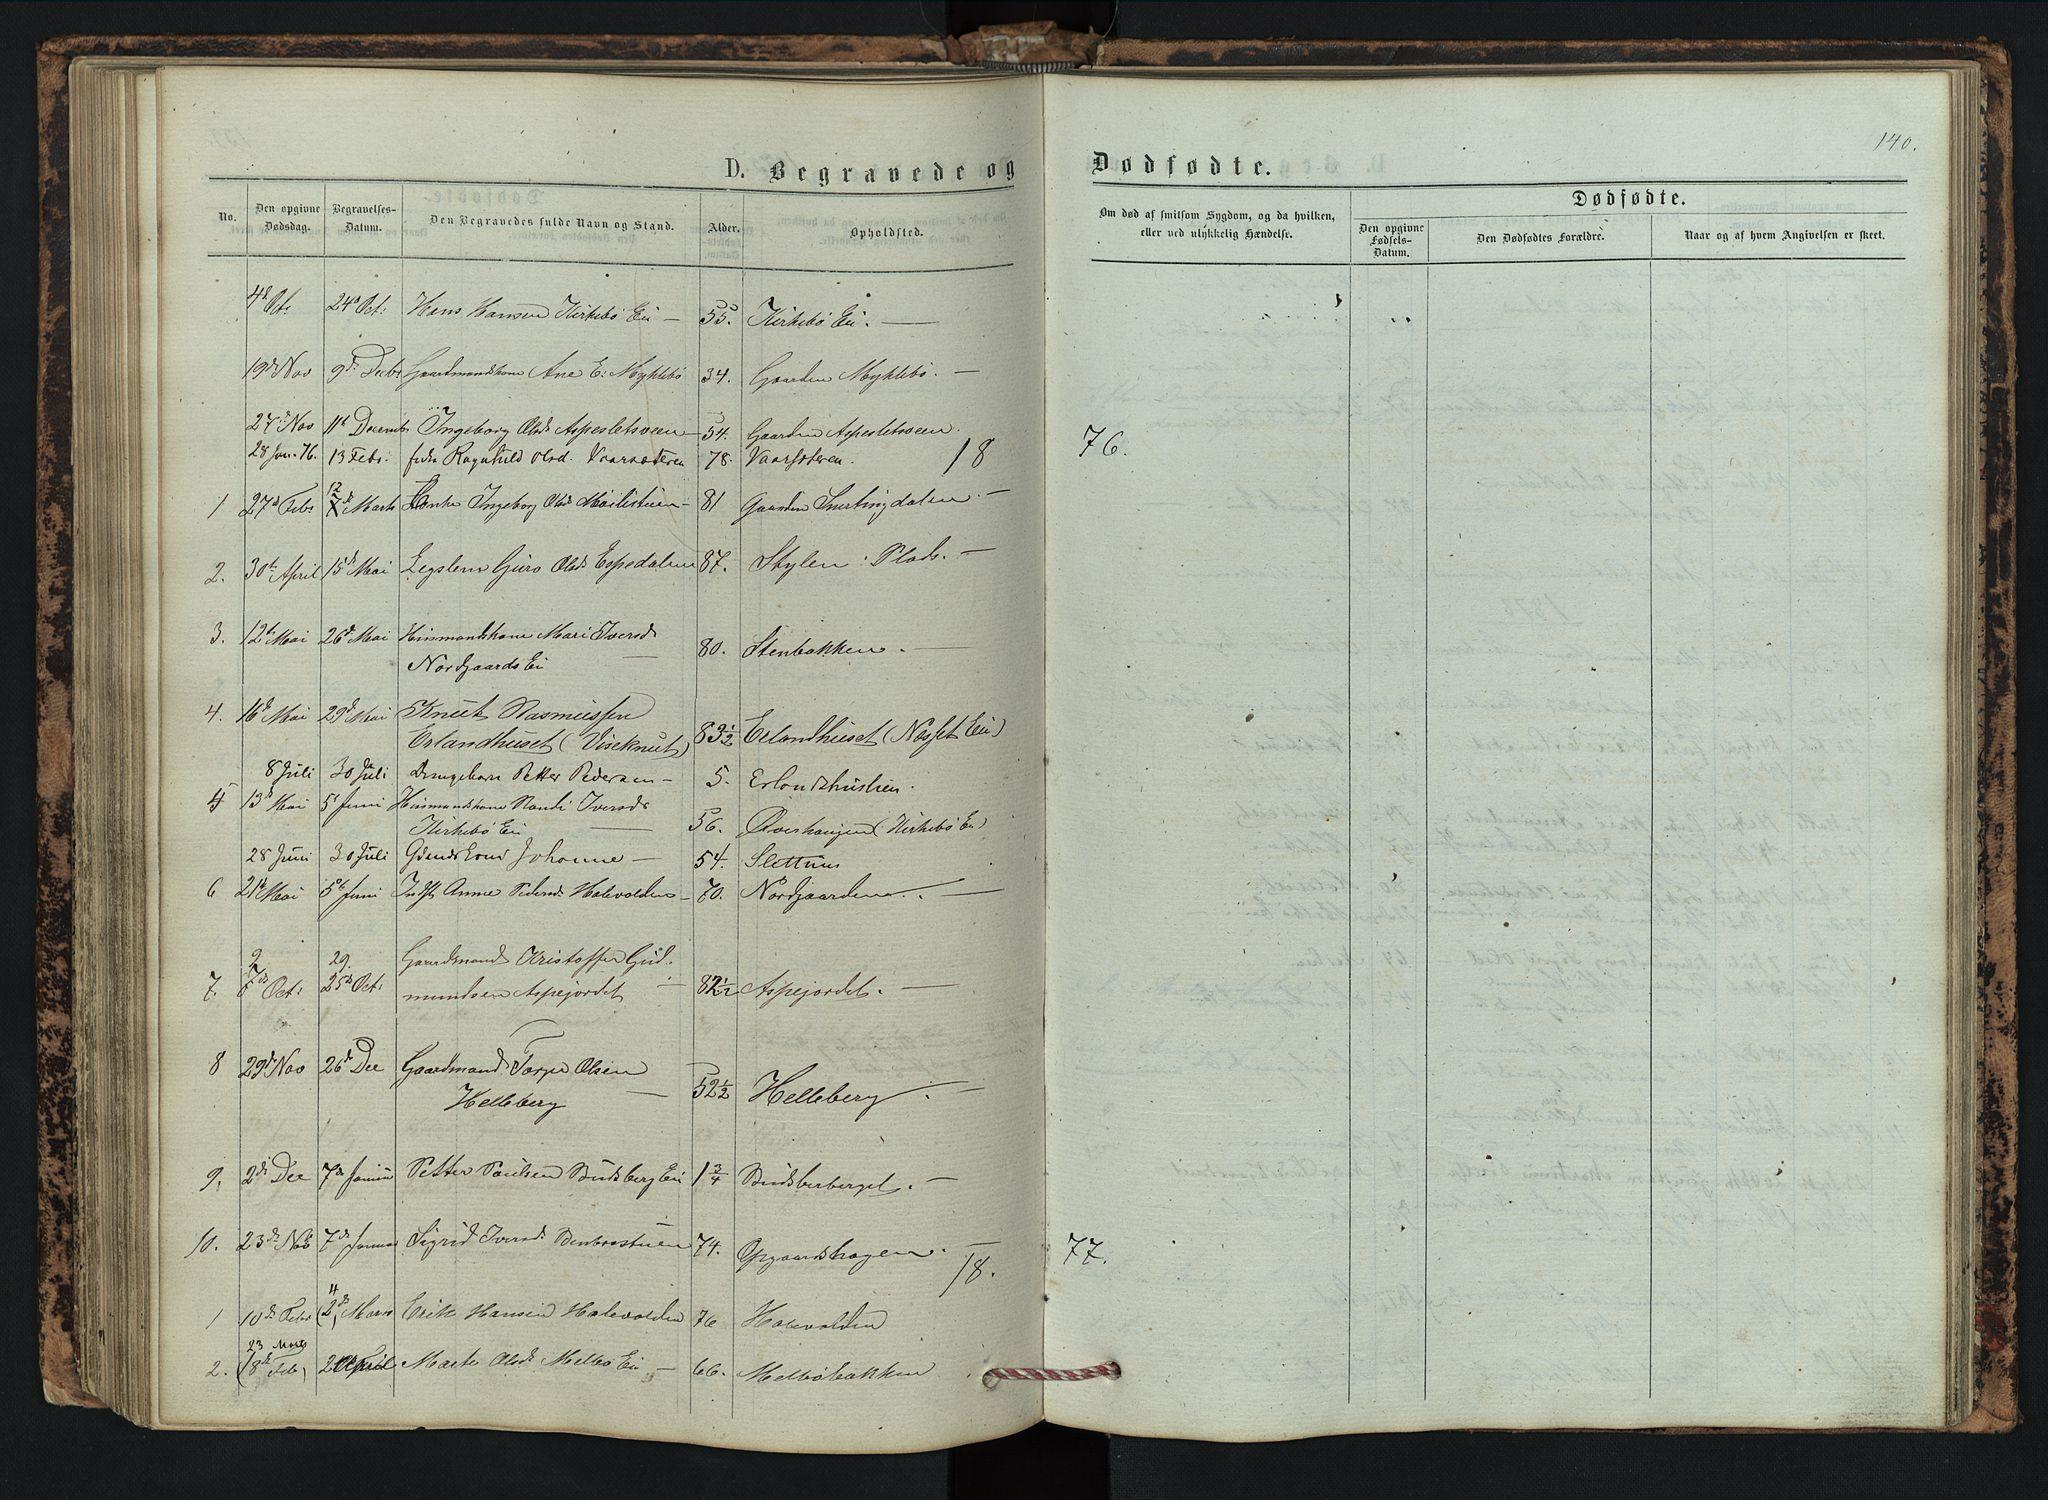 SAH, Vestre Gausdal prestekontor, Klokkerbok nr. 2, 1874-1897, s. 140